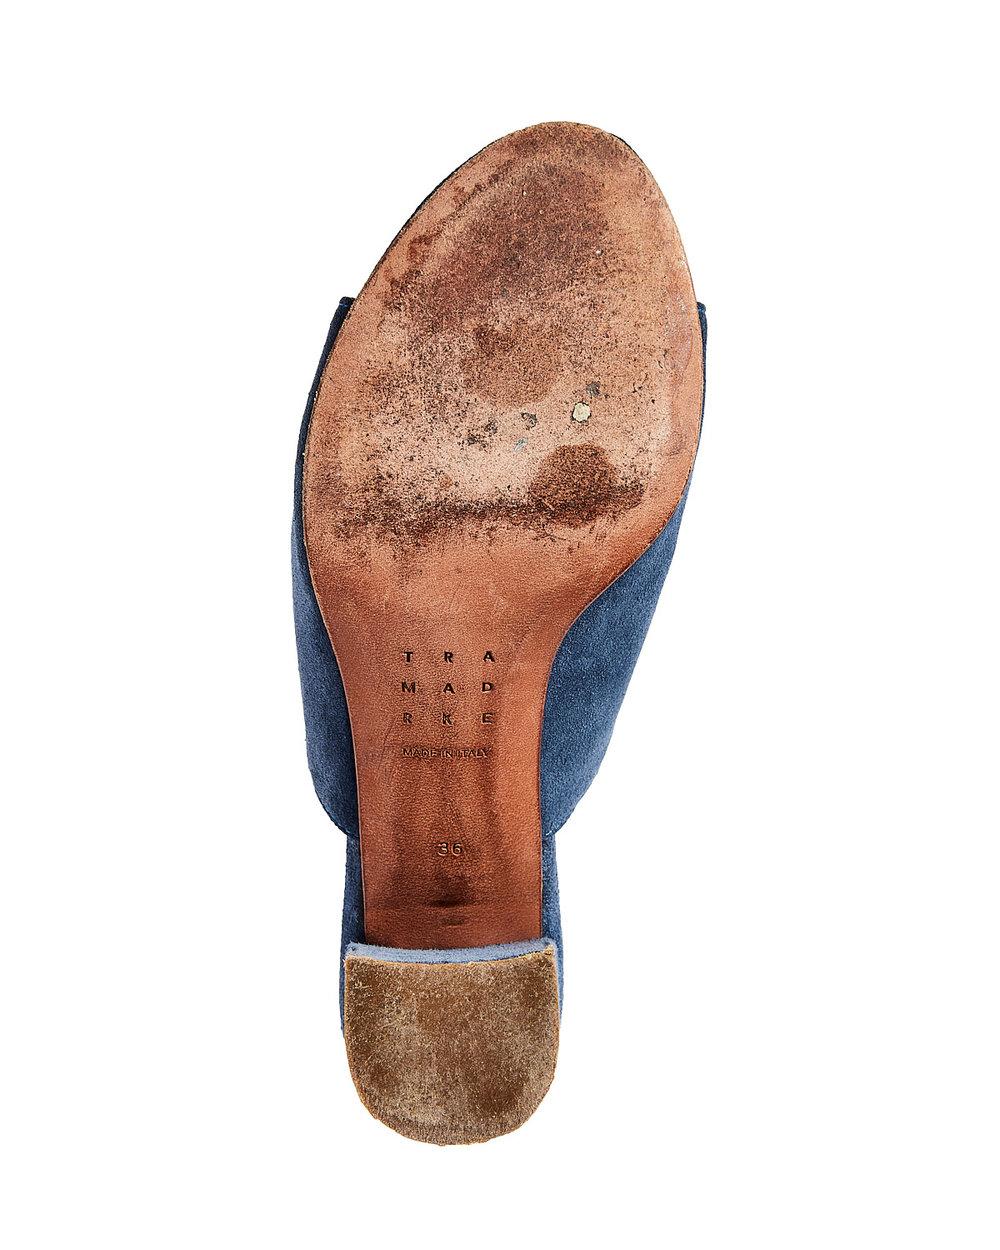 SOLES_TRADEMARK_PUMP_18610.jpg